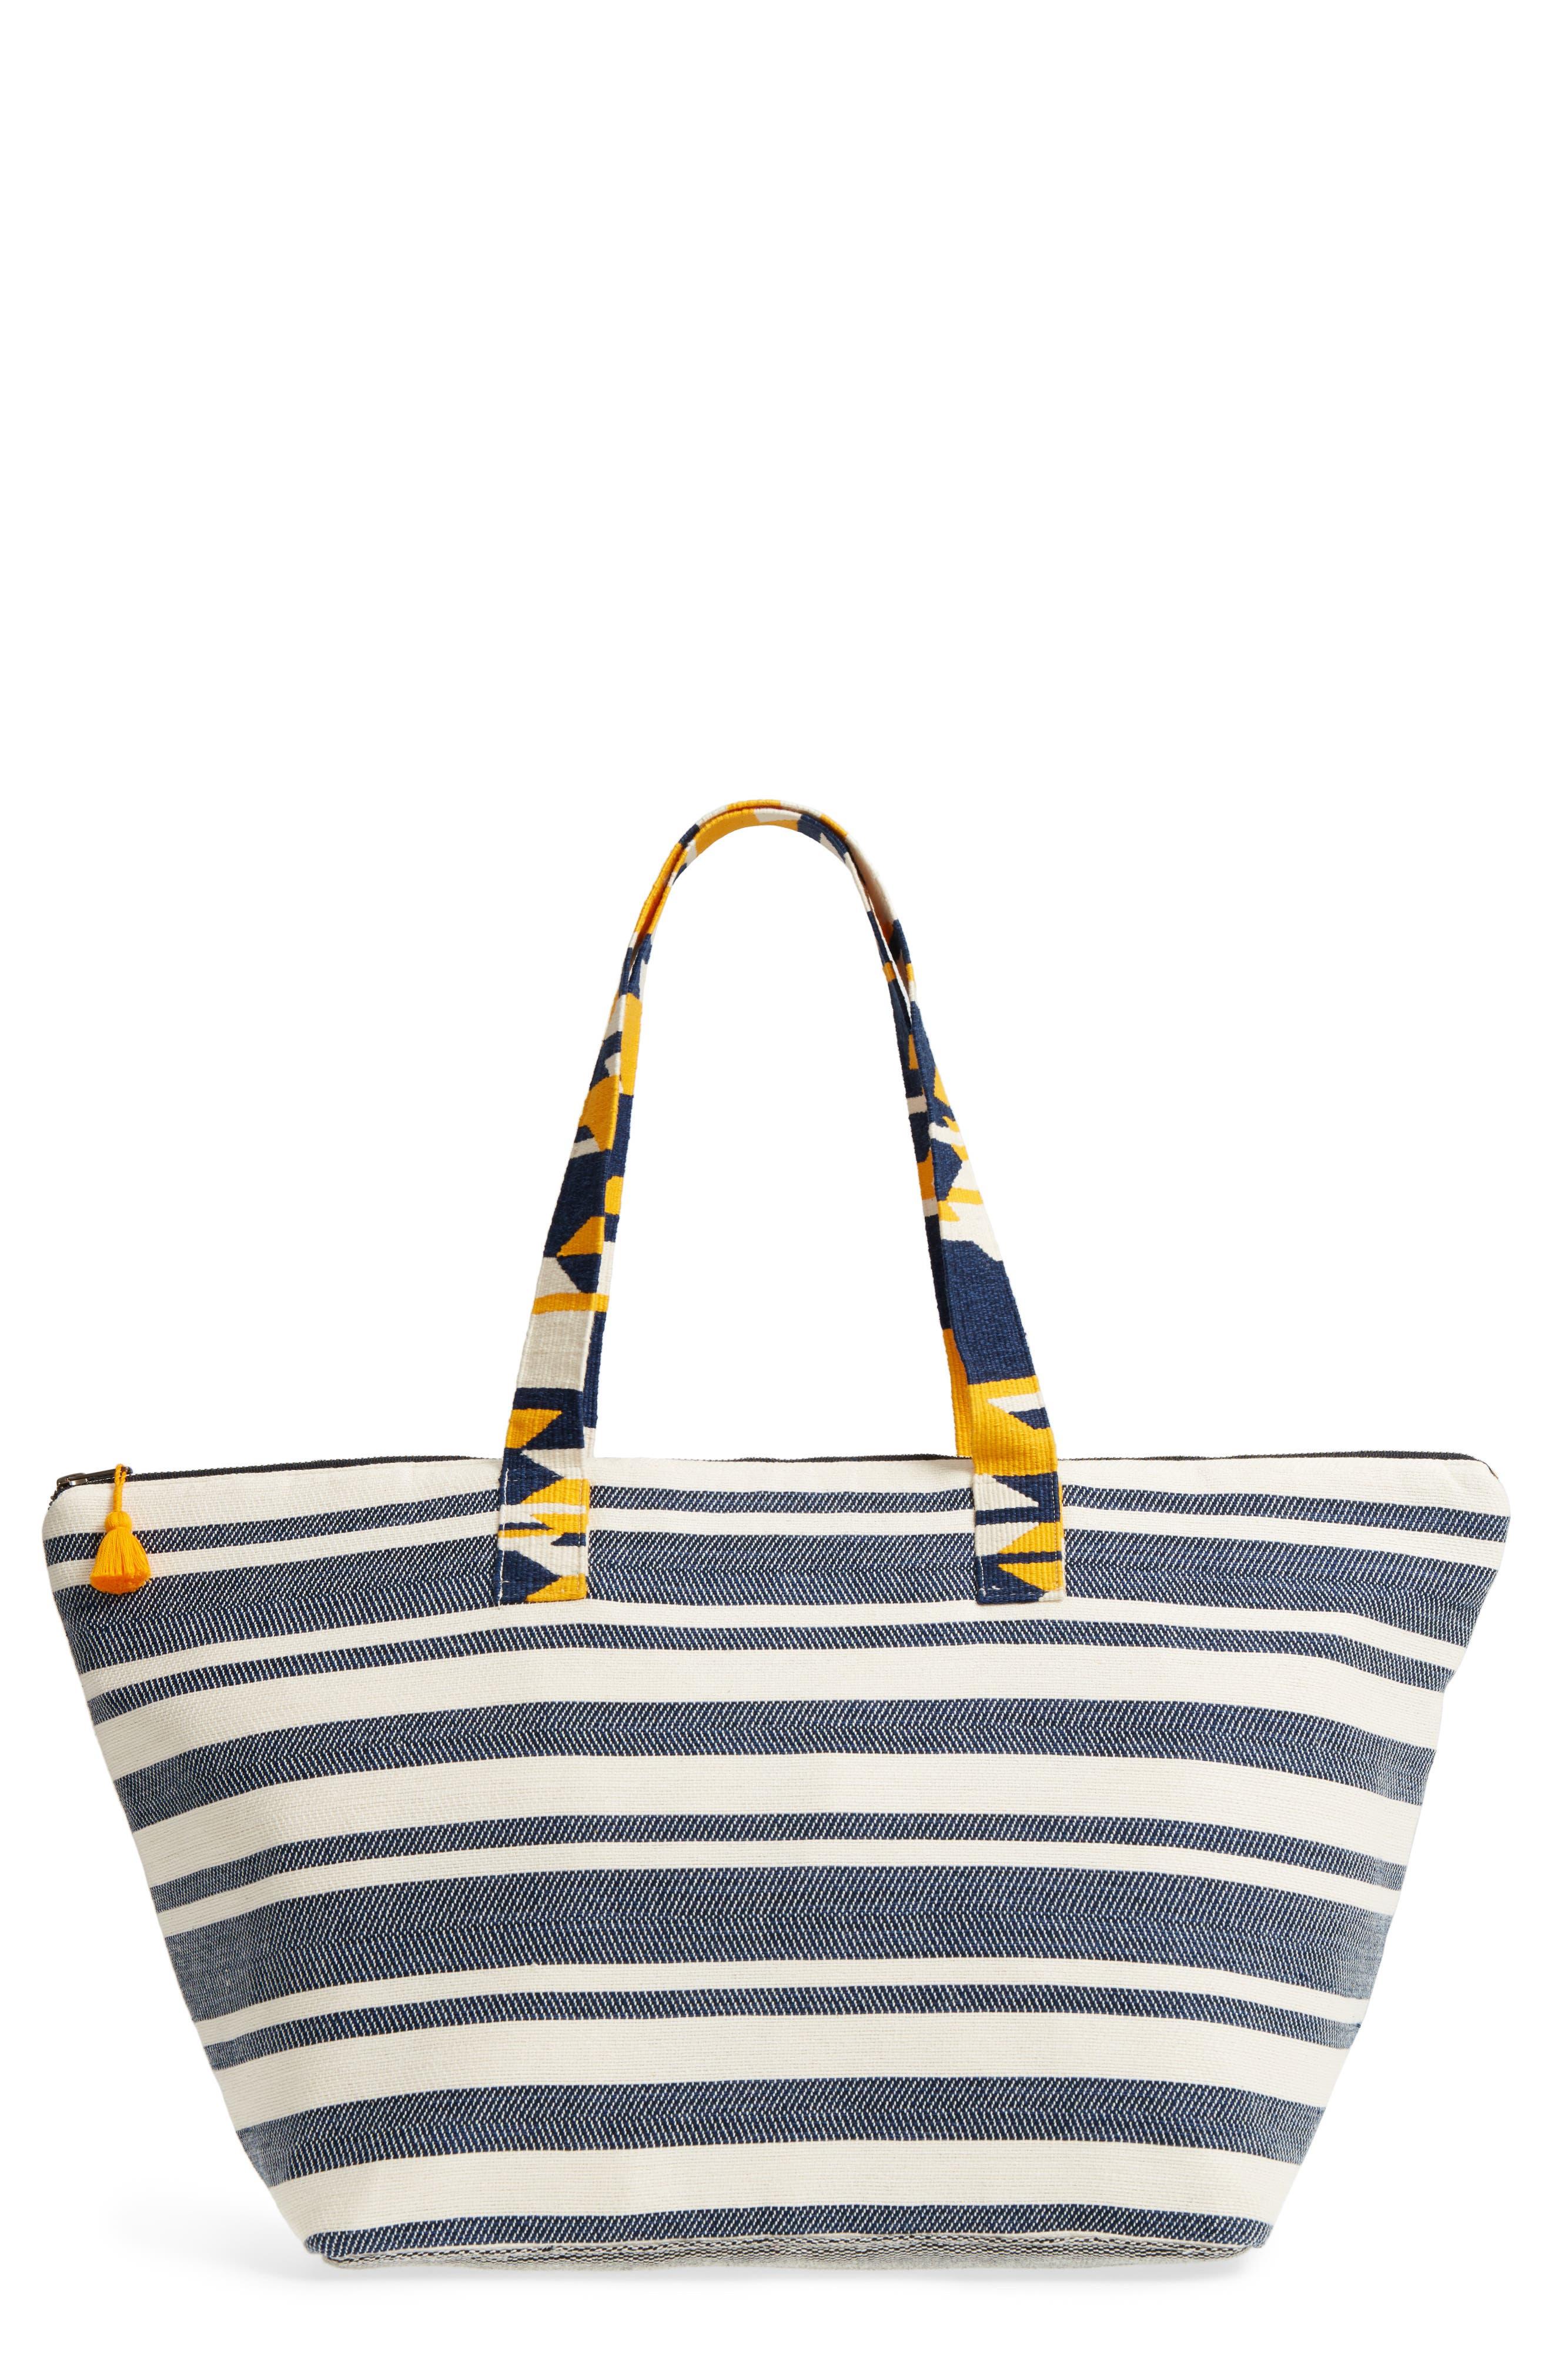 Iris Beach Bag,                         Main,                         color, Sungold Denim Twill